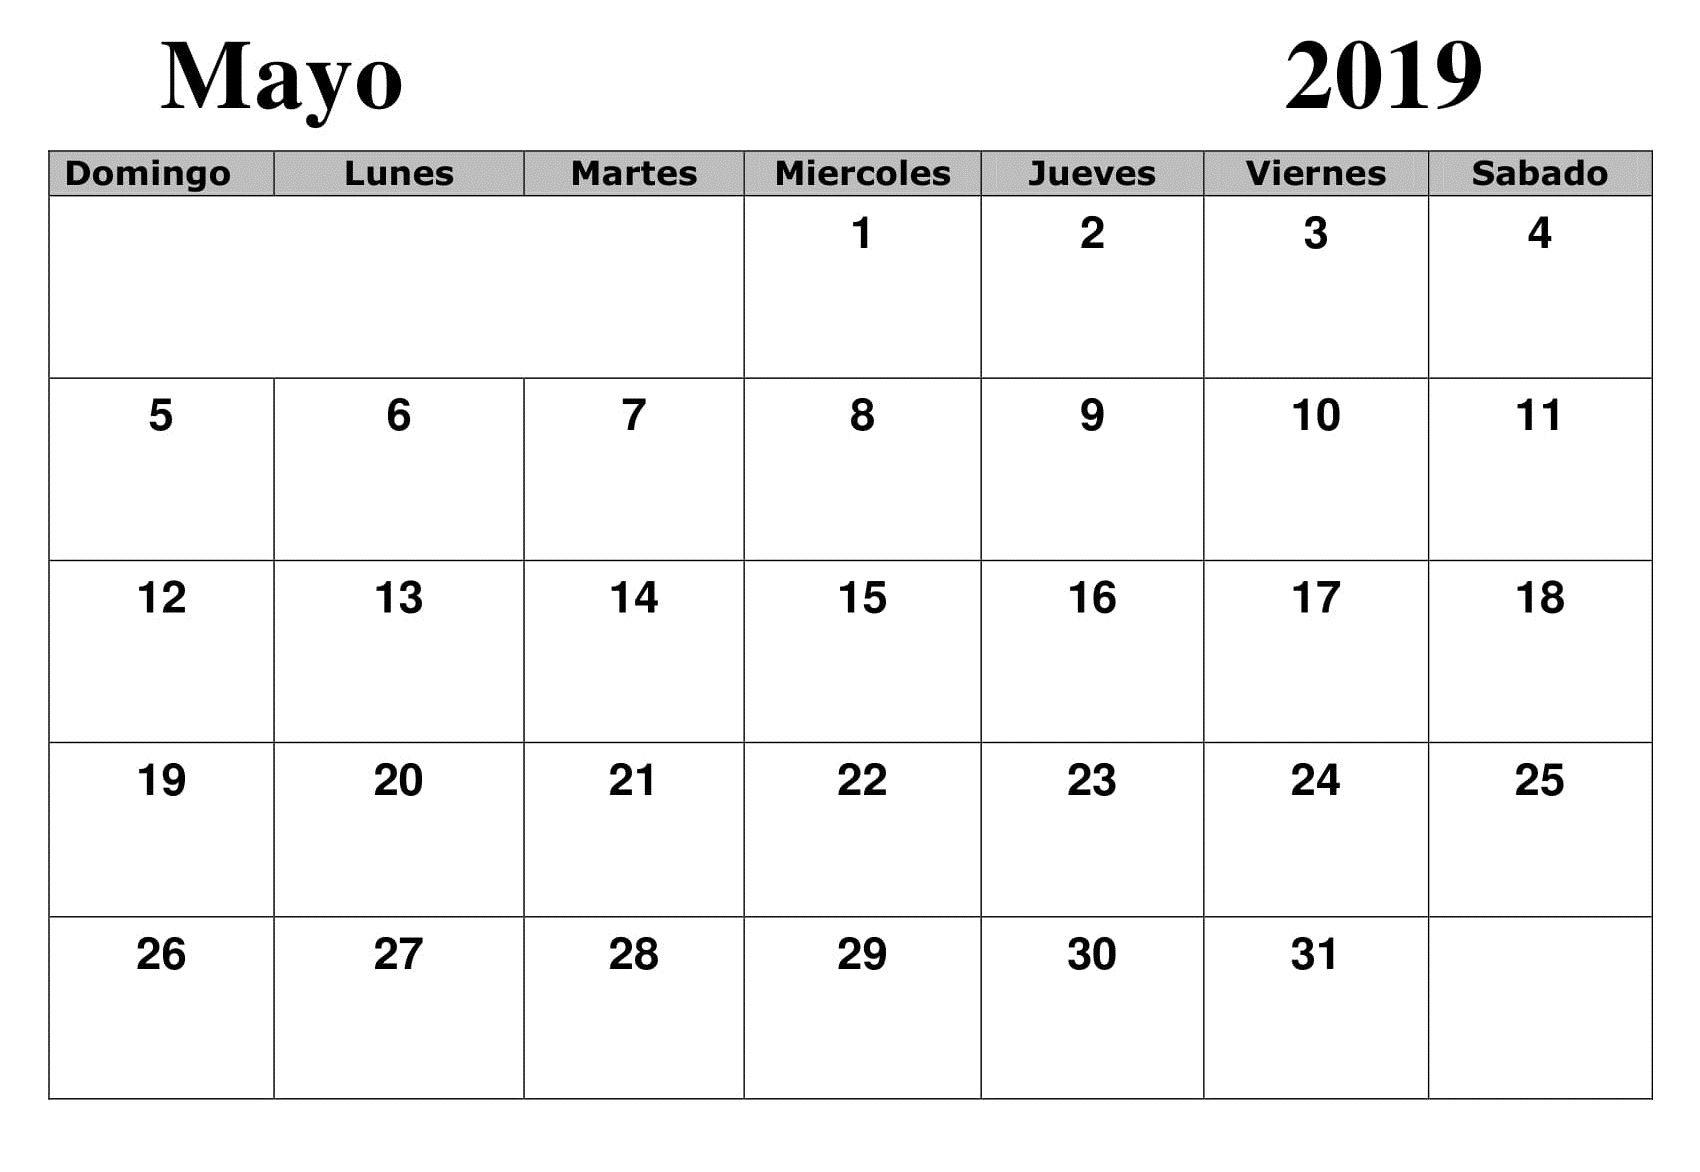 Calendario Word 2019.Calendario 2019 Mayo Word Calendario Mayo 2019 Para Imprimir